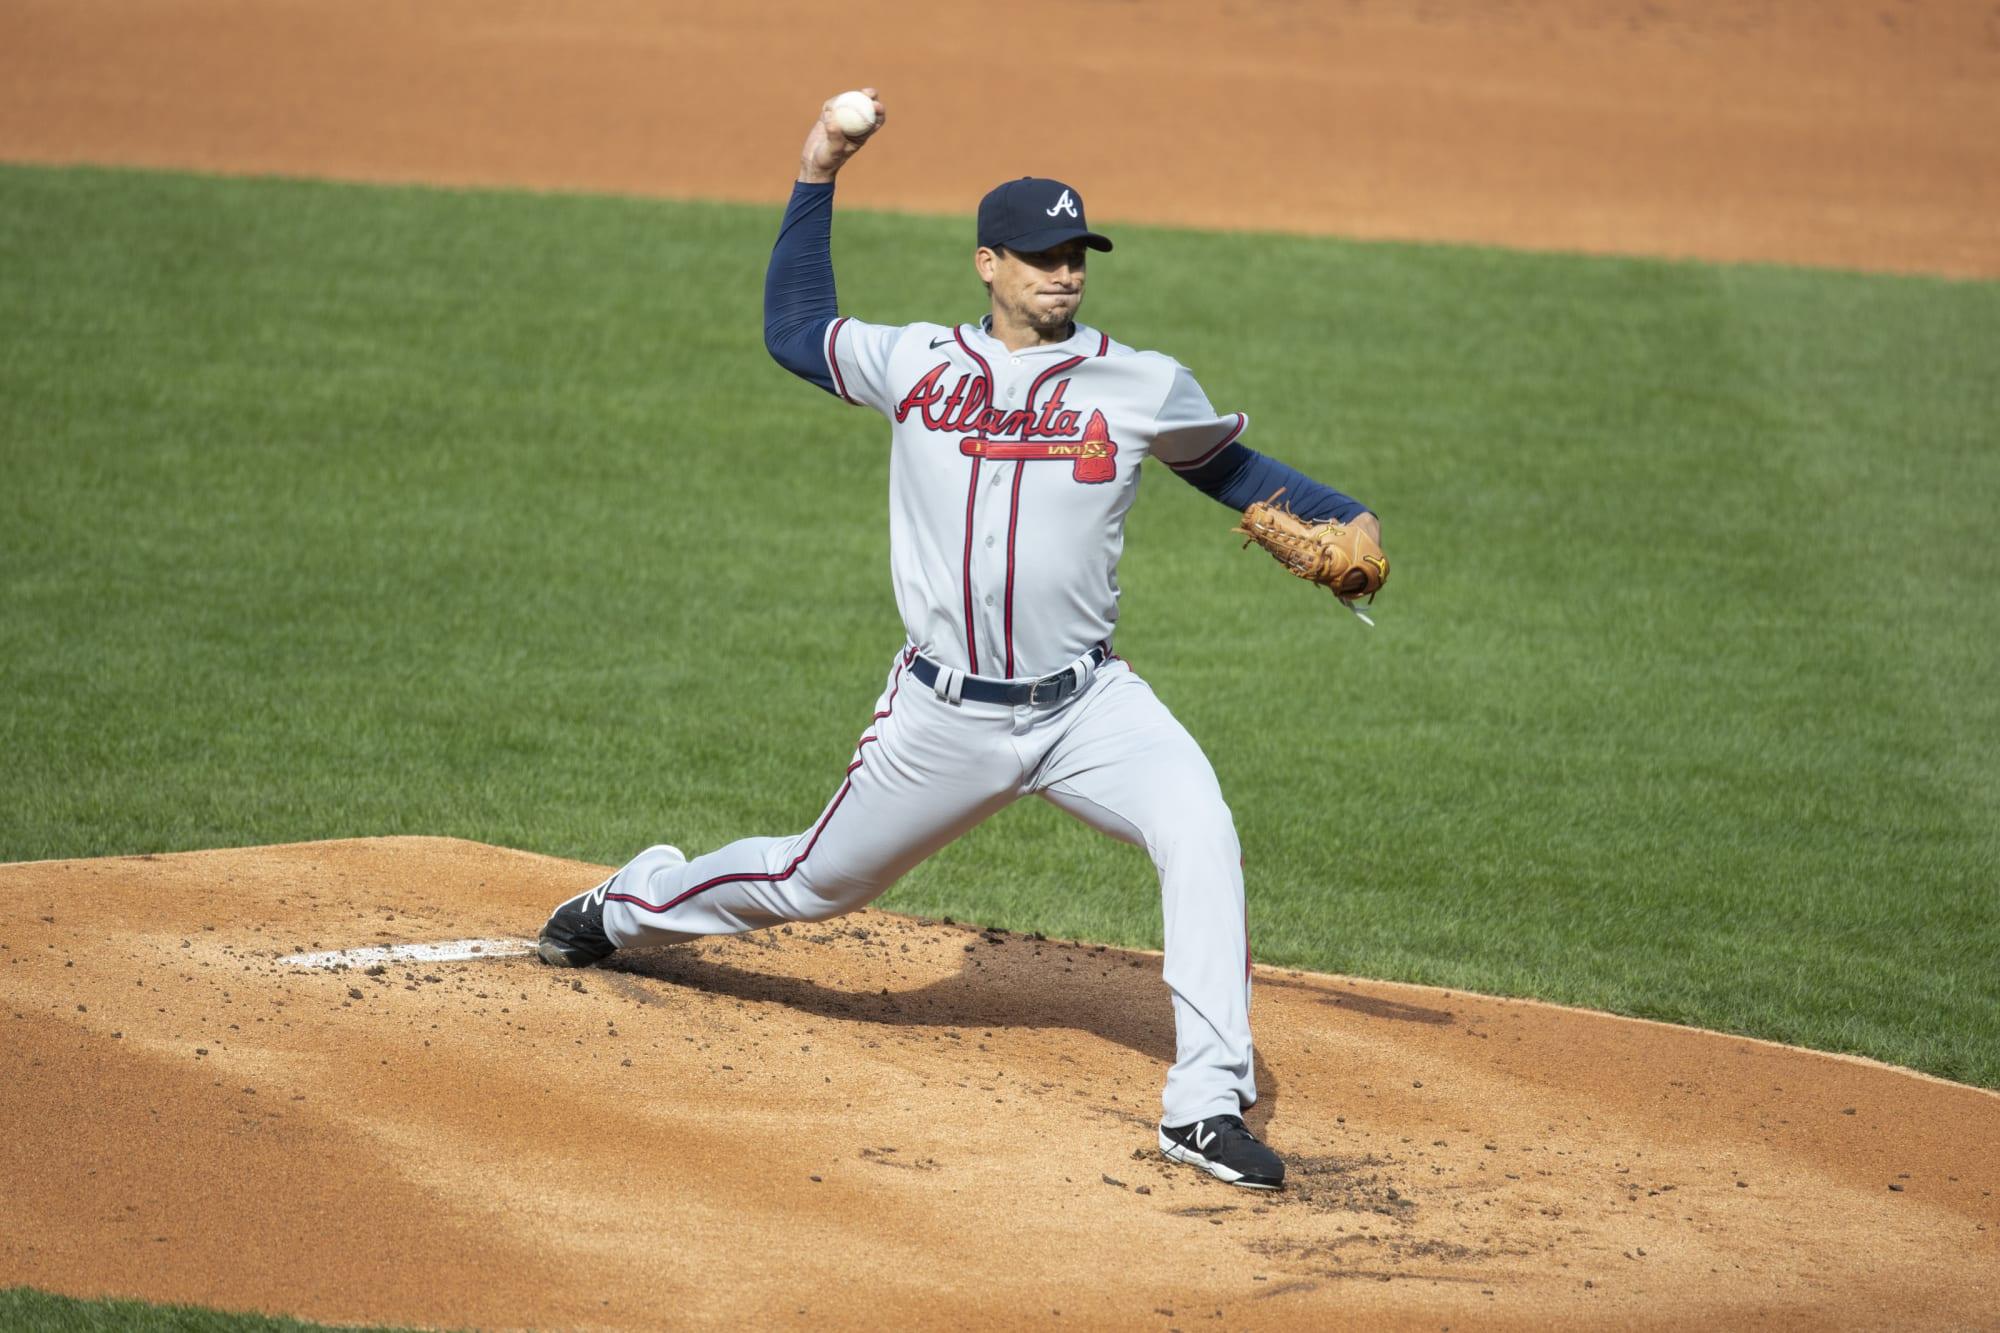 Atlanta Braves: Charlie Morton Makes Season Debut as Braves Fall 4-0